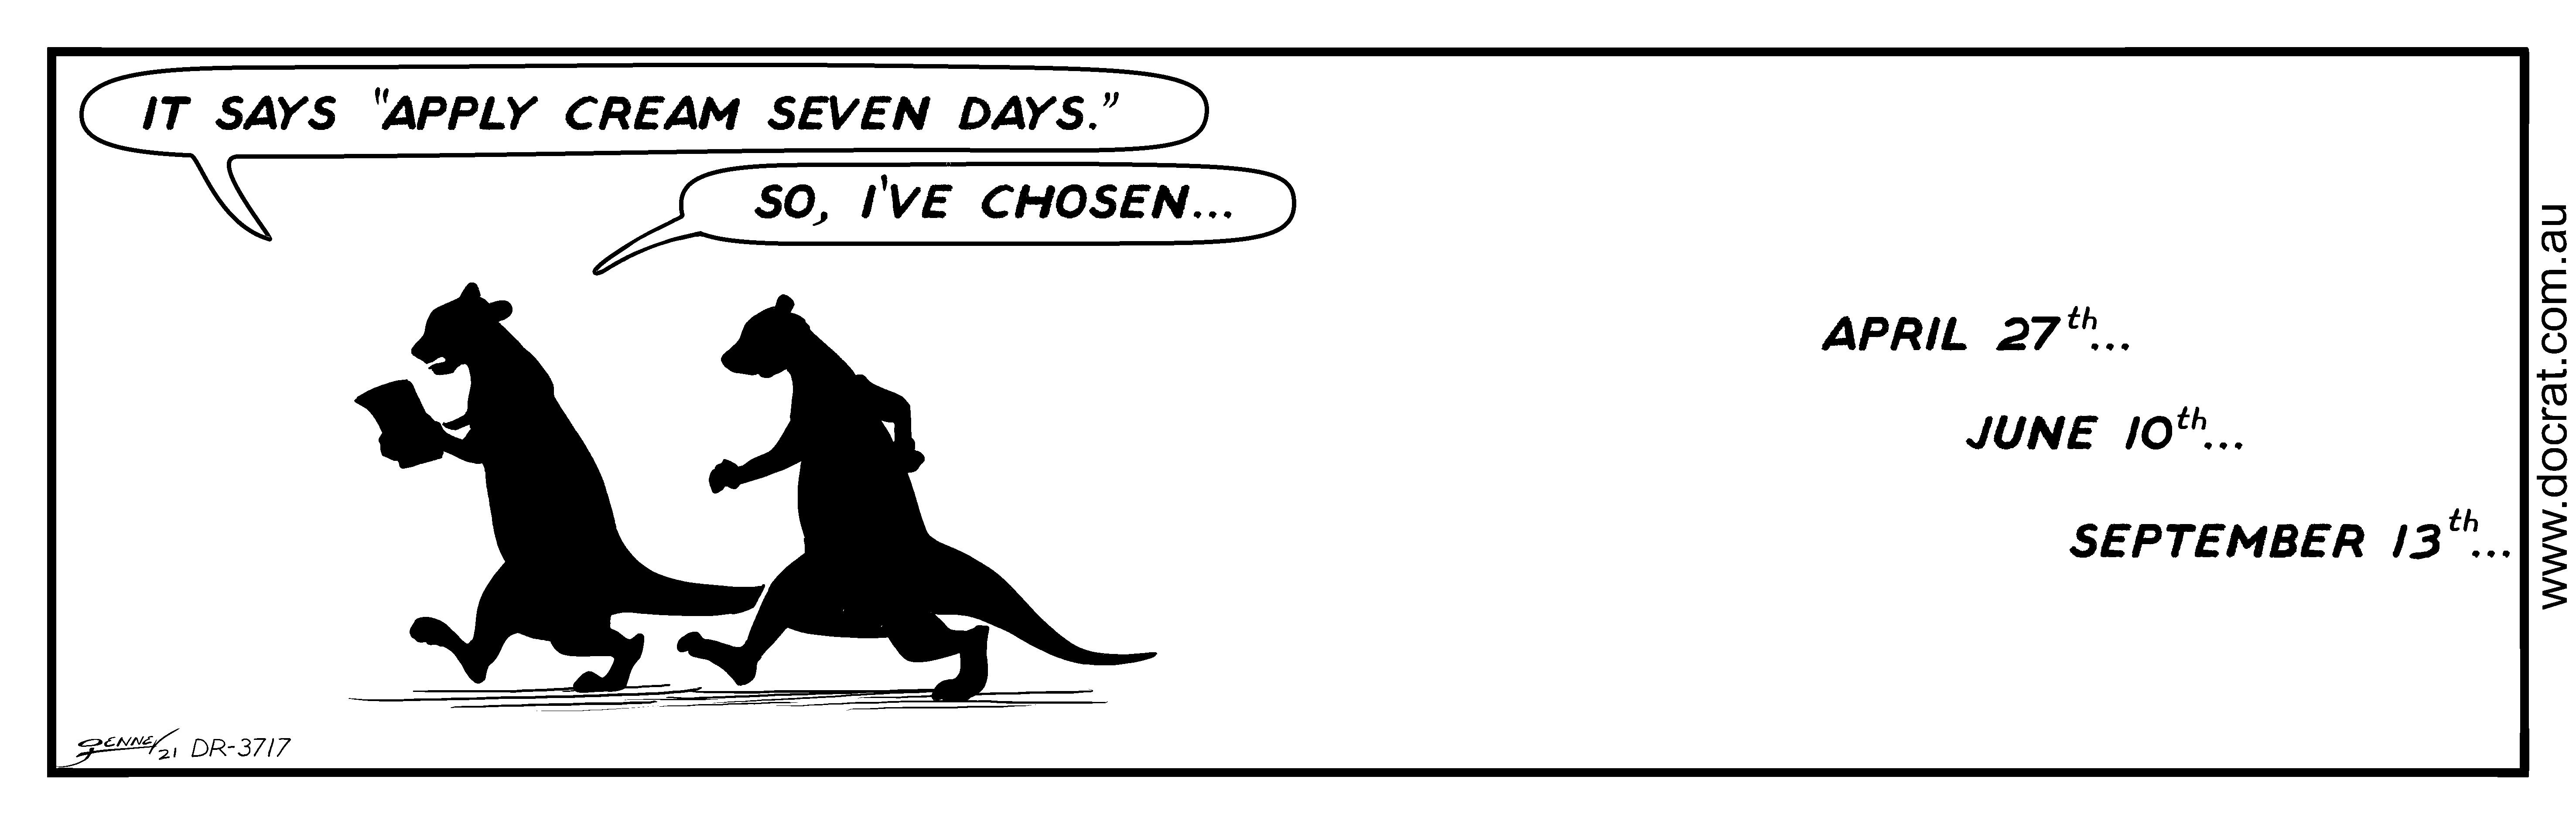 20210413